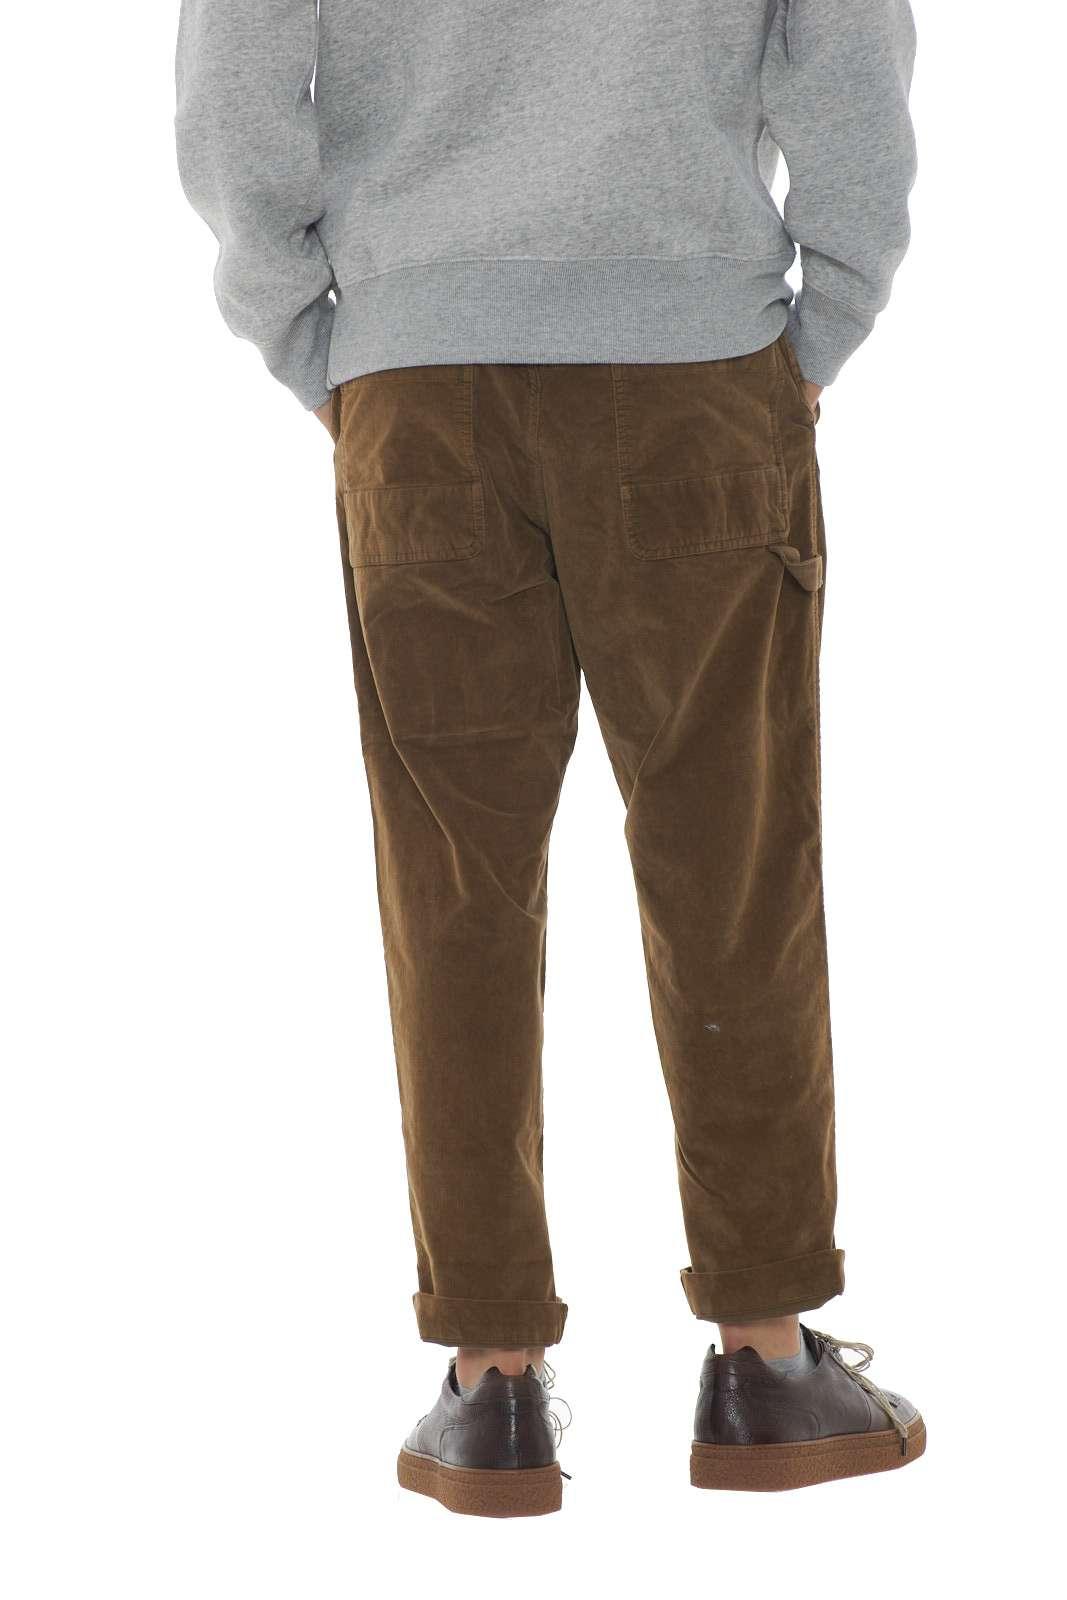 https://www.parmax.com/media/catalog/product/a/i/AI-outlet_parmax-pantaloni-uomo-Diesel-00SZKX0JATD-Cjpg_1.jpg